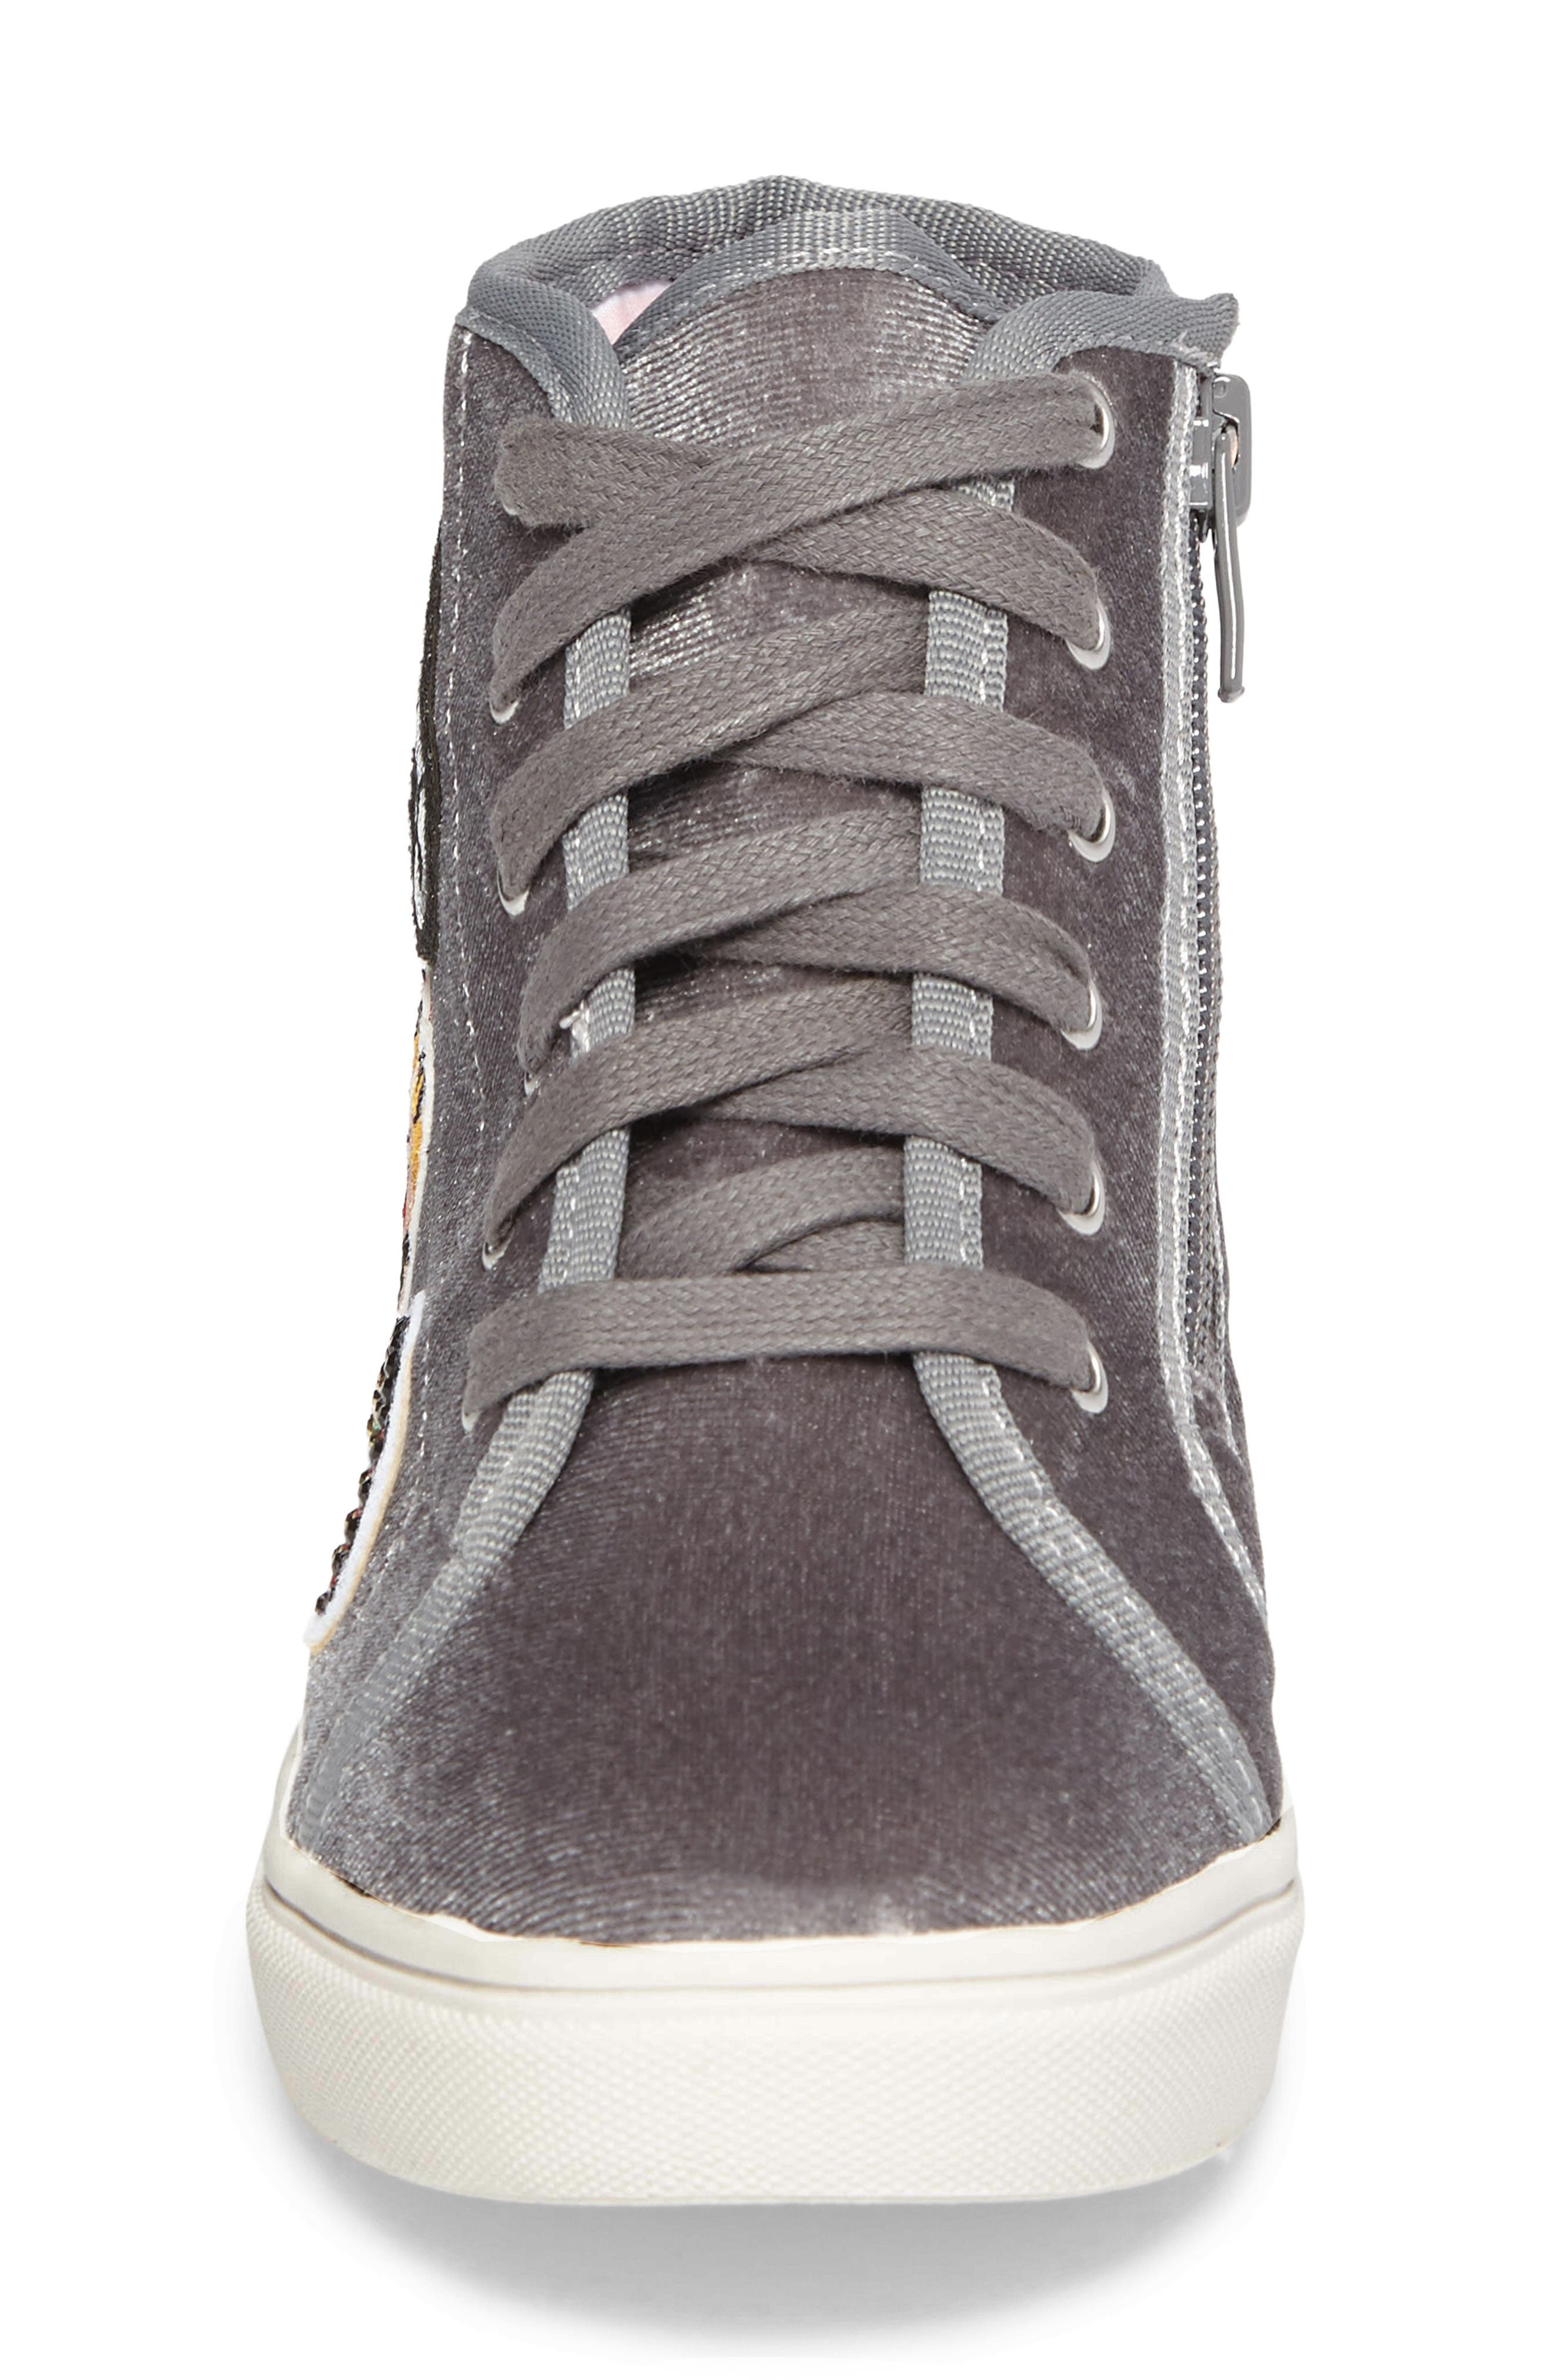 J-BFF High Top Sneaker,                             Alternate thumbnail 4, color,                             055